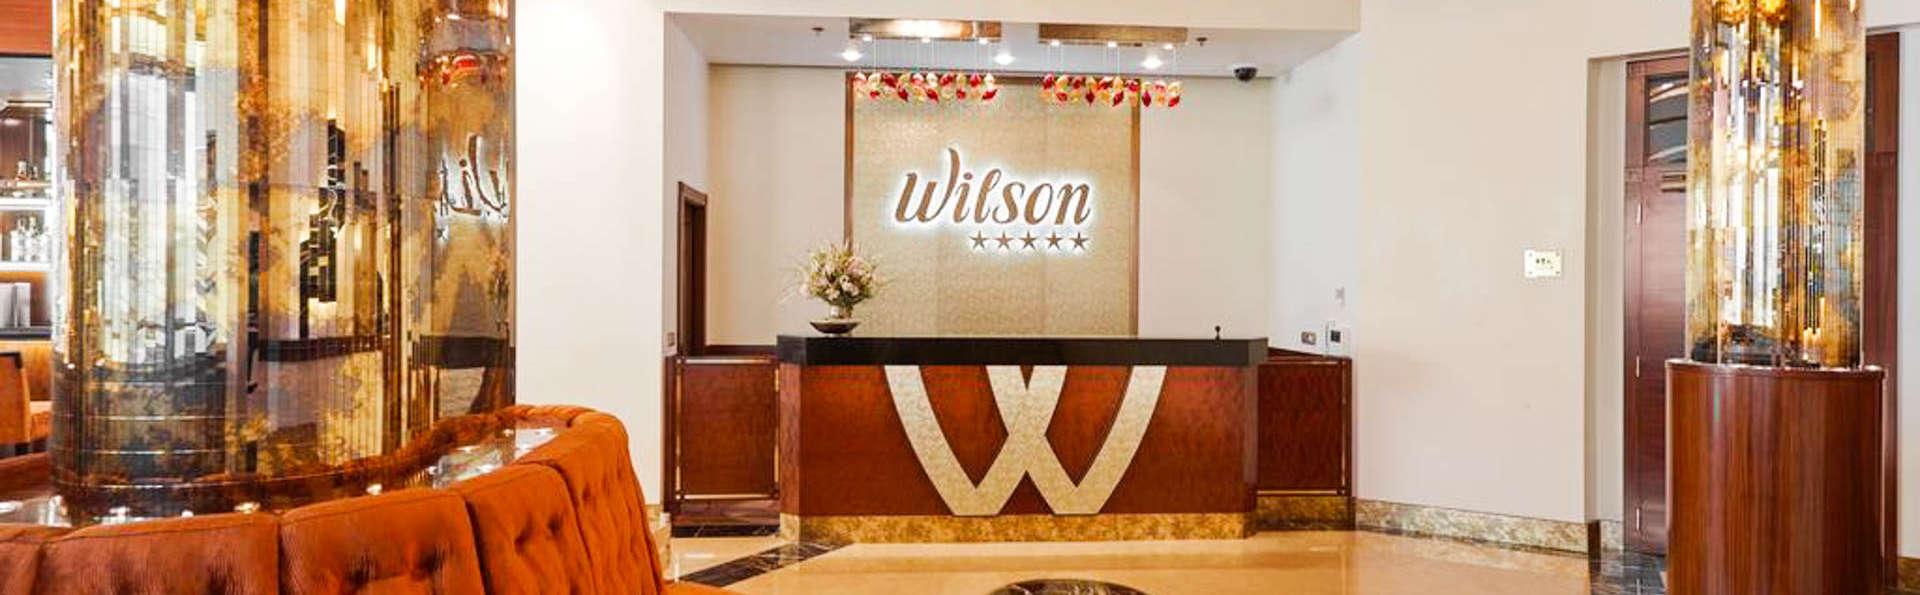 Occidental Wilson Praha - EDIT_RECEPTION.jpg